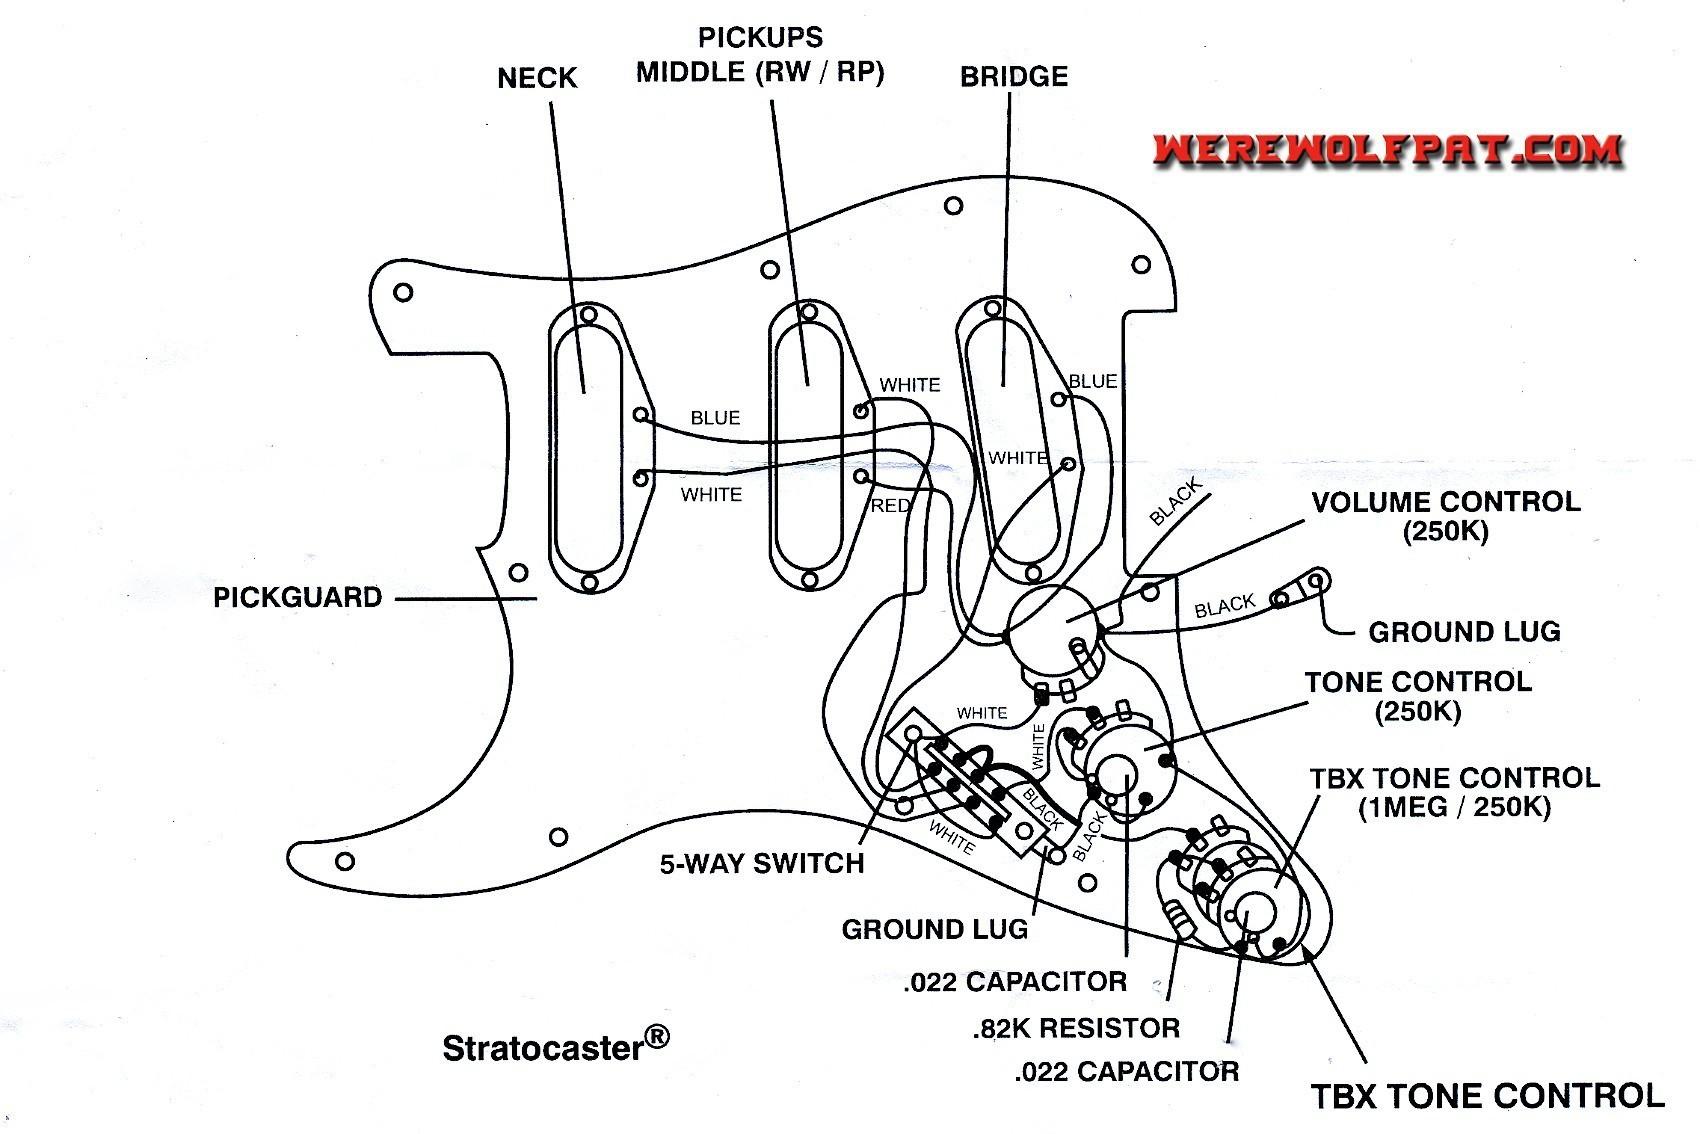 Stratocaster Hsh Wiring Diagram Fresh Fender Strat Wiring Diagram